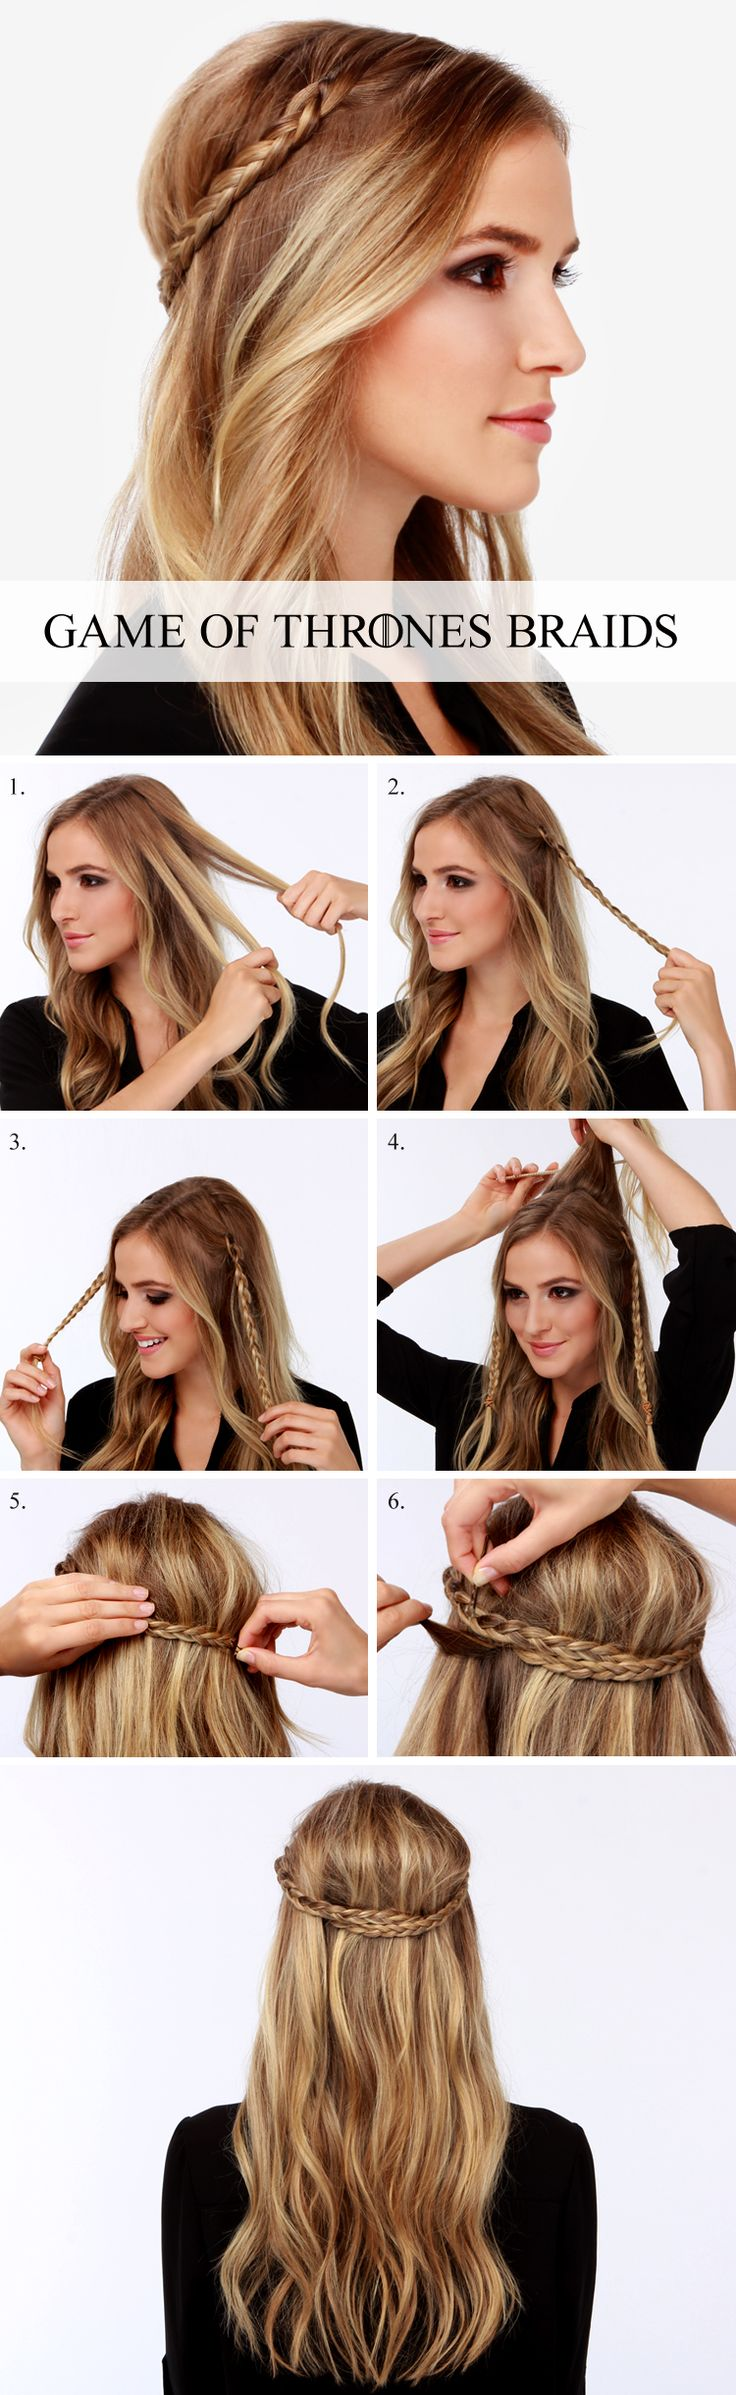 DIY Game Of Thrones Braid - Simple But Powerful Braided Hair Tutorials